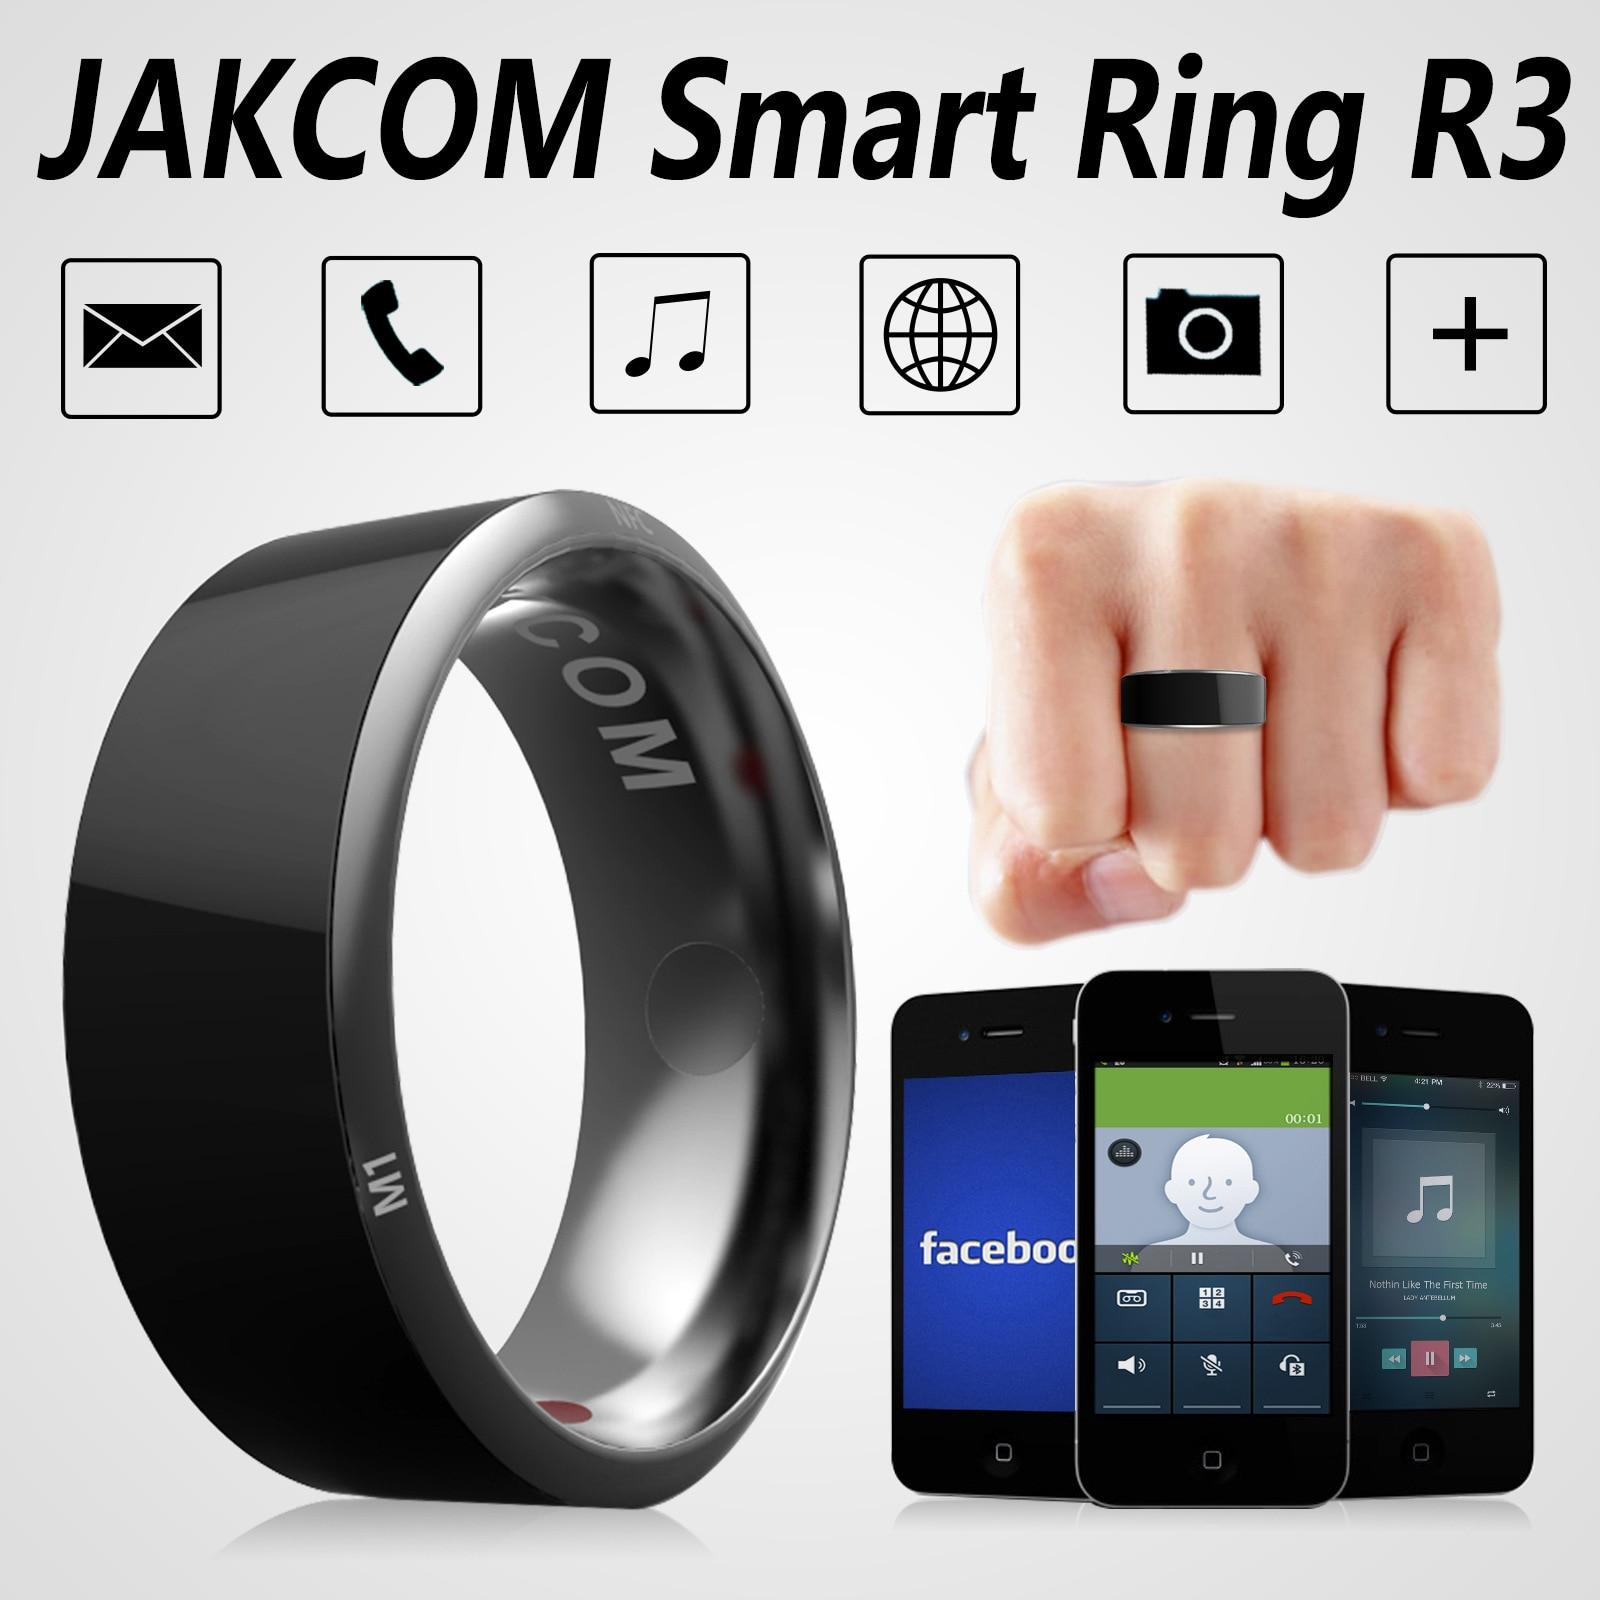 Jakcom R3 Smart Ring Electronic CNC Metal Mini Magic RFID NFC 125khz 13.56mhz IC/ID Rewritable Access Control Key Card Tag Copy